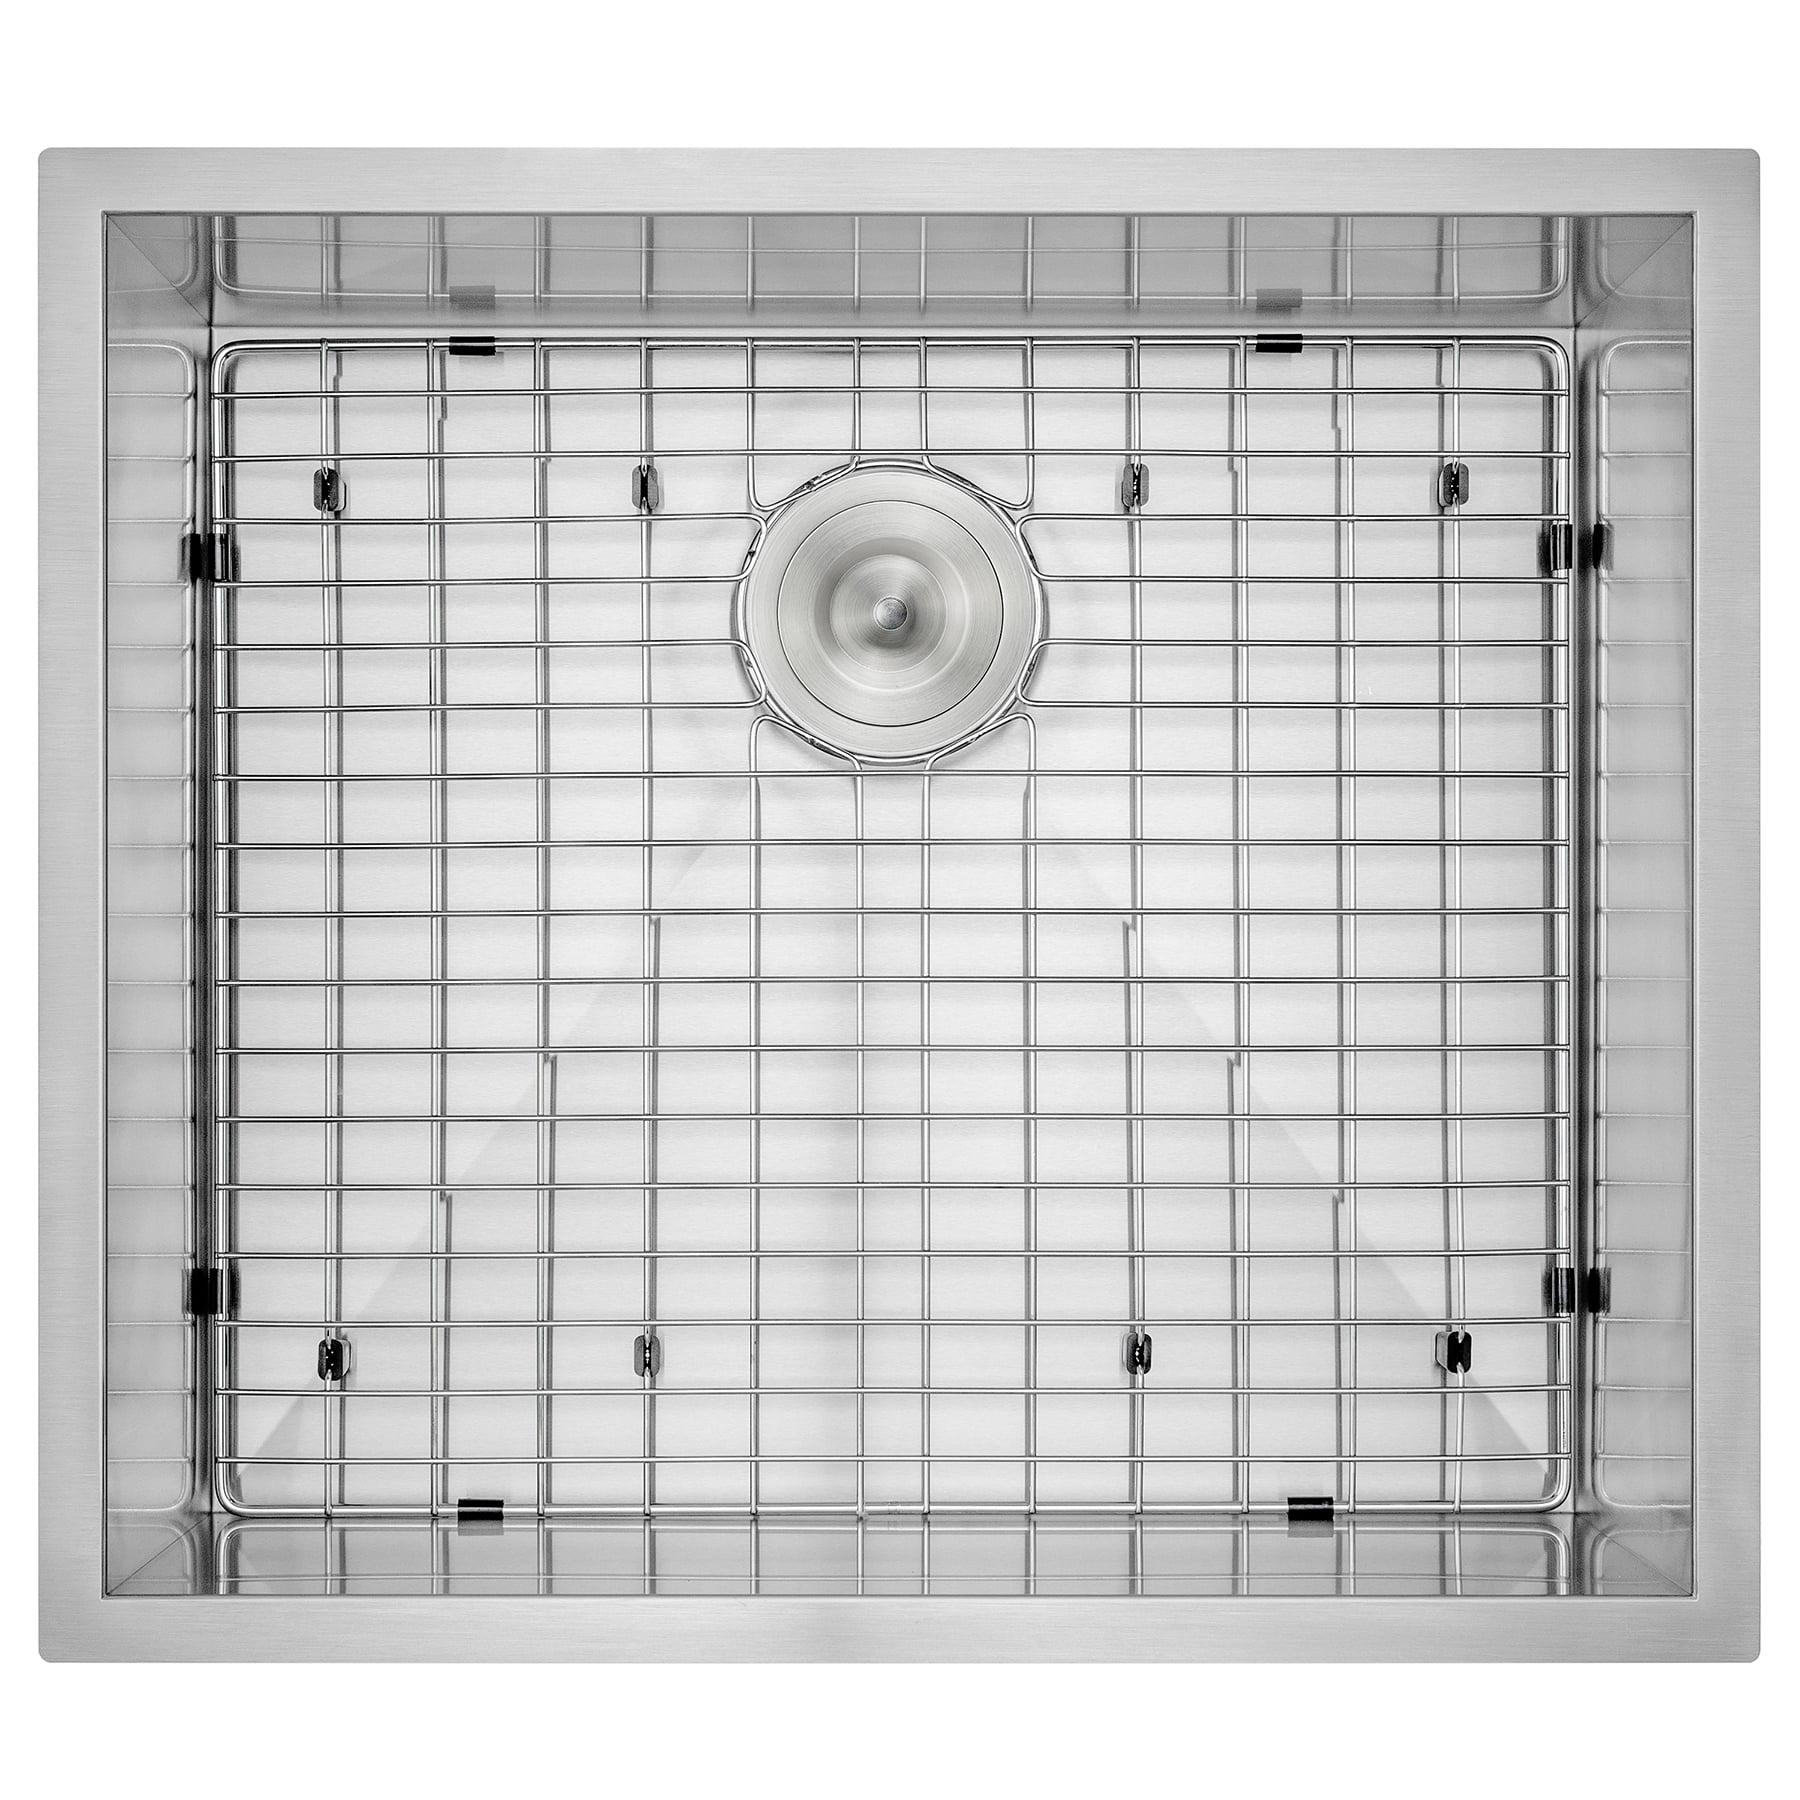 "Image of AKDY 25"" x 22"" x 9"" Handmade Under Mount Single Basin 18 Gauge Stainless Steel Kitchen Sink w/ Dish Grid Drain Kit"